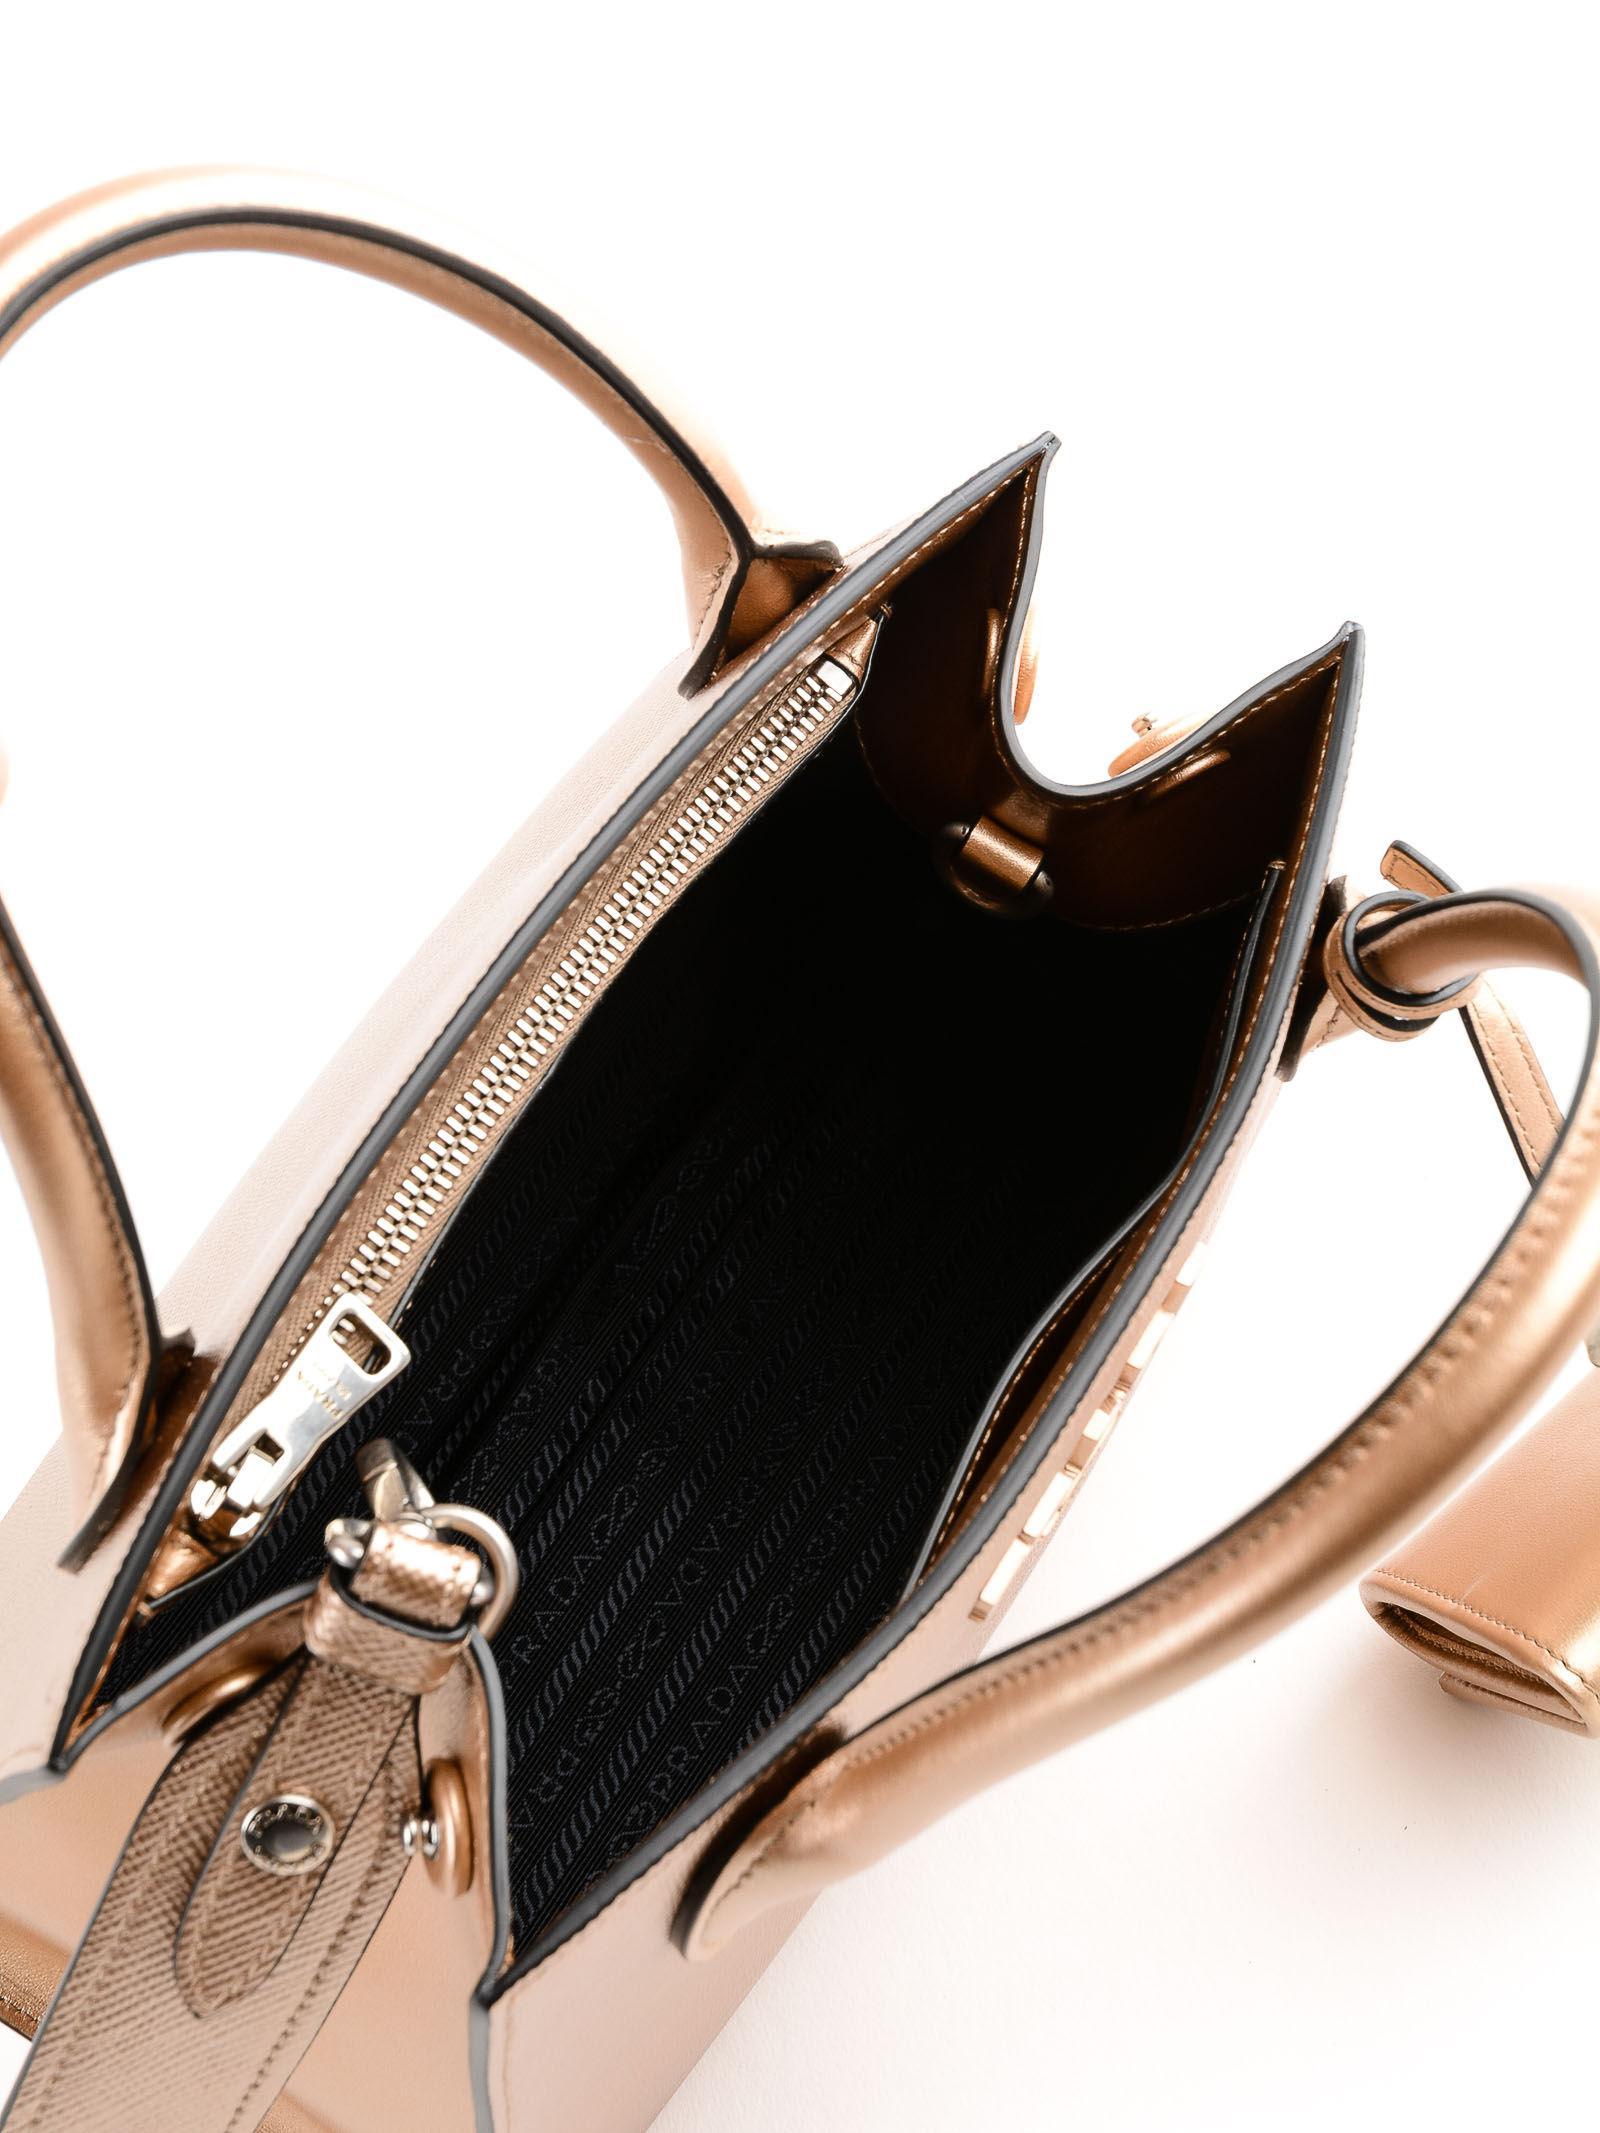 49ac2d548665 Prada Monochrome Handbag in Natural - Lyst